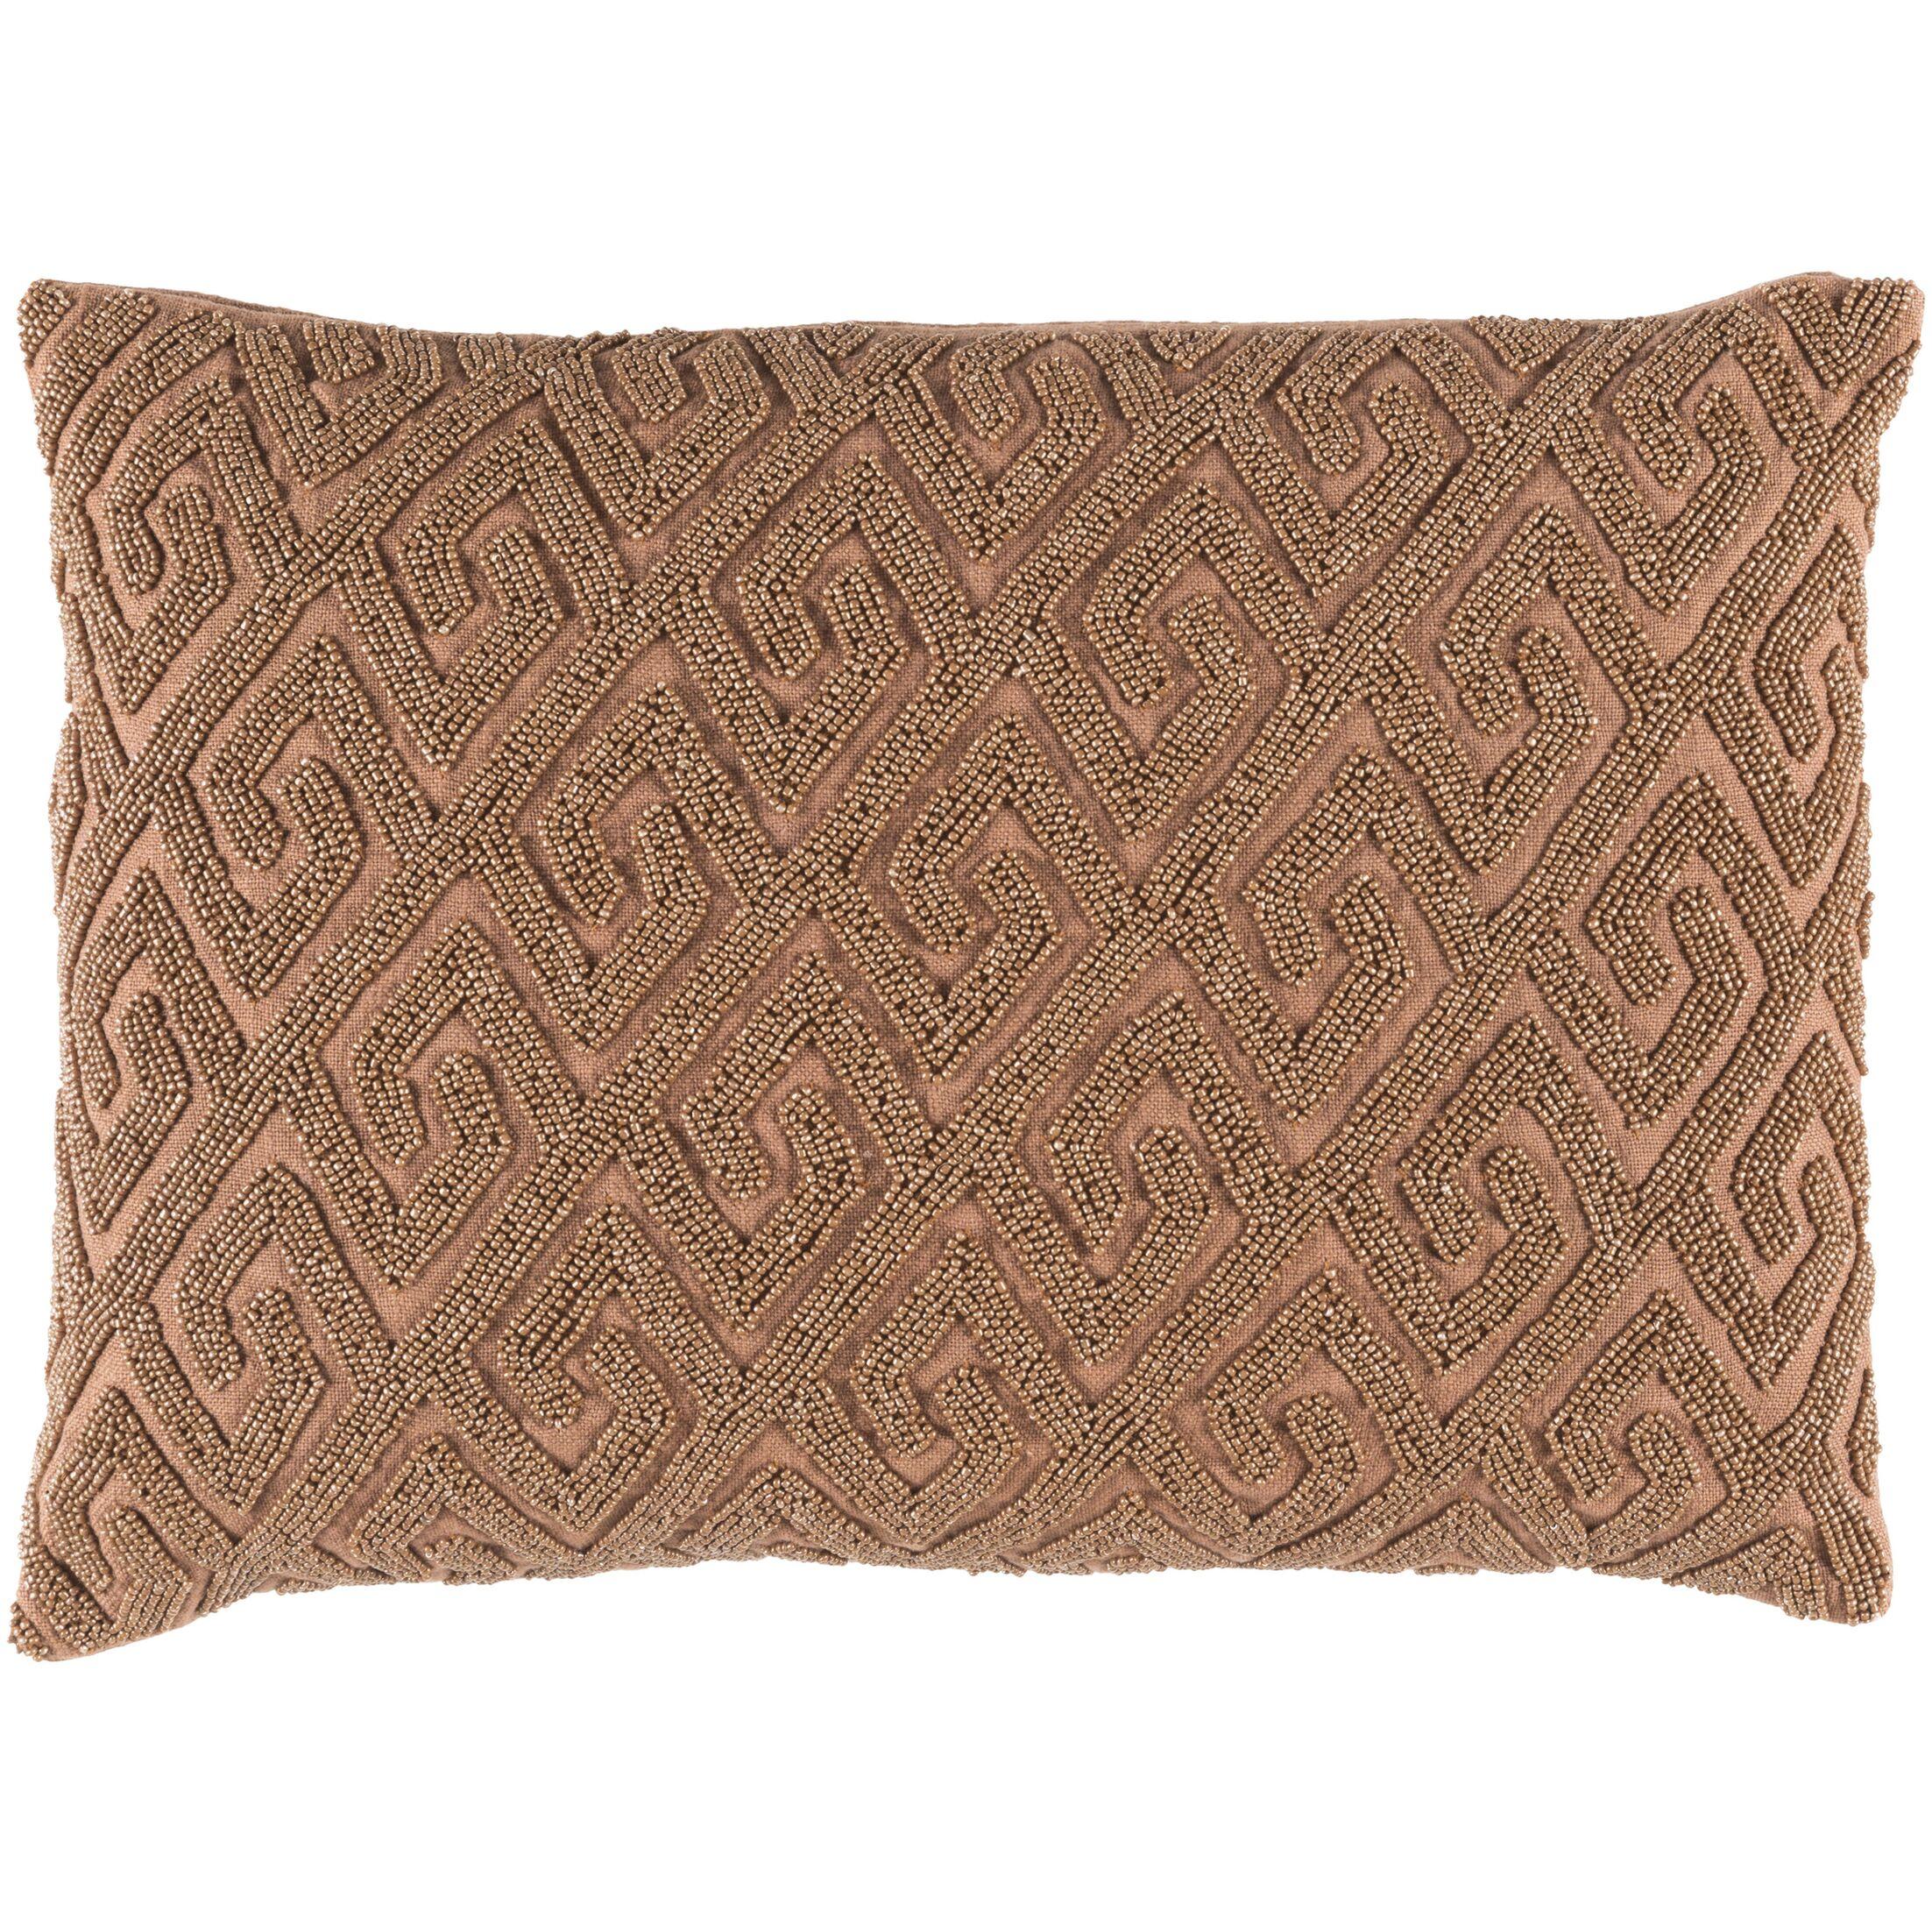 Dexter 100% Cotton Lumbar Pillow Cover Color: Brown